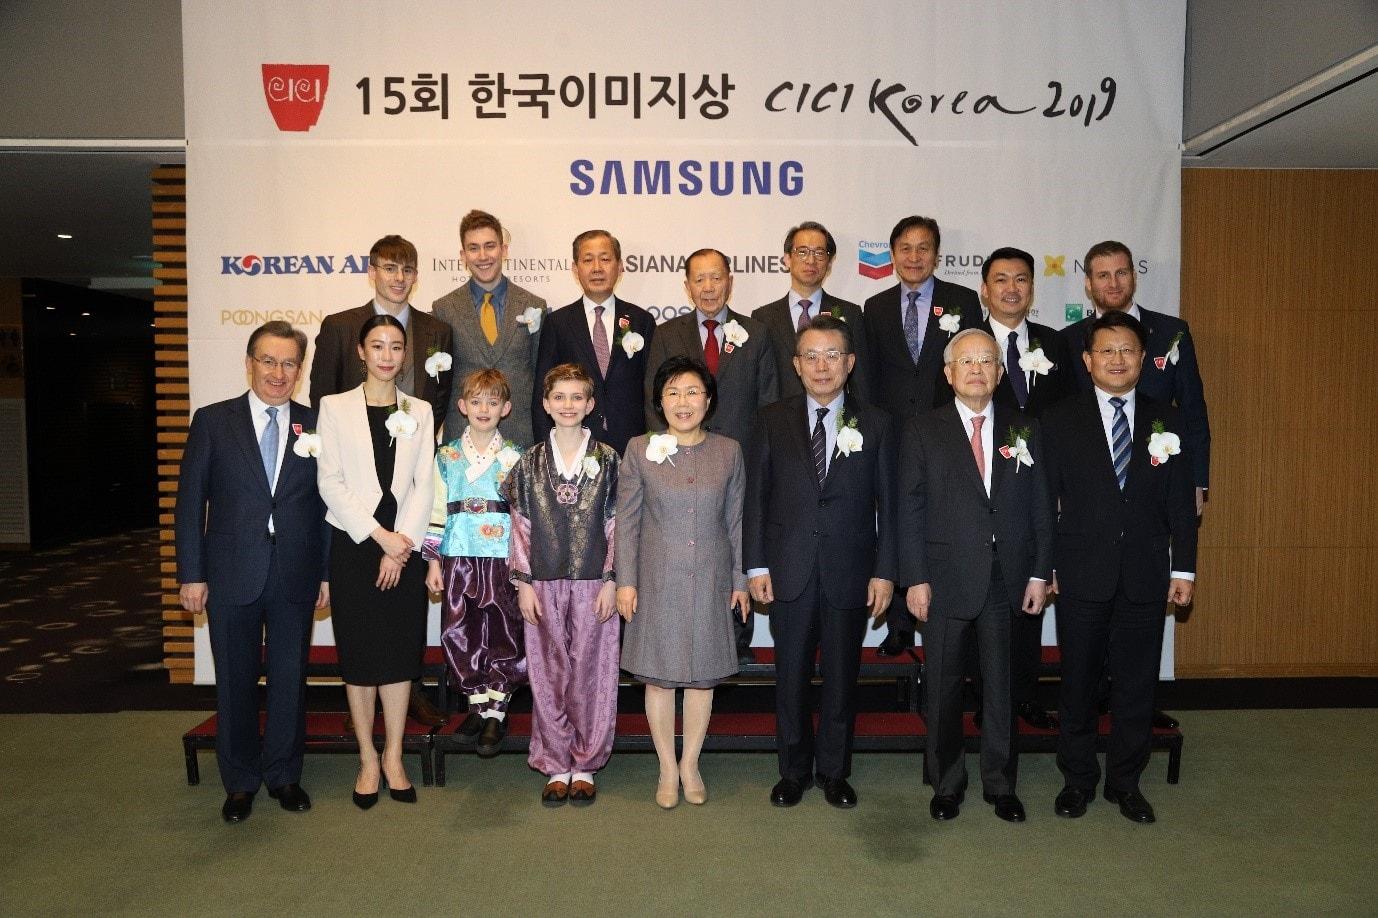 What's New - Epilogue of CICI Korea 2019